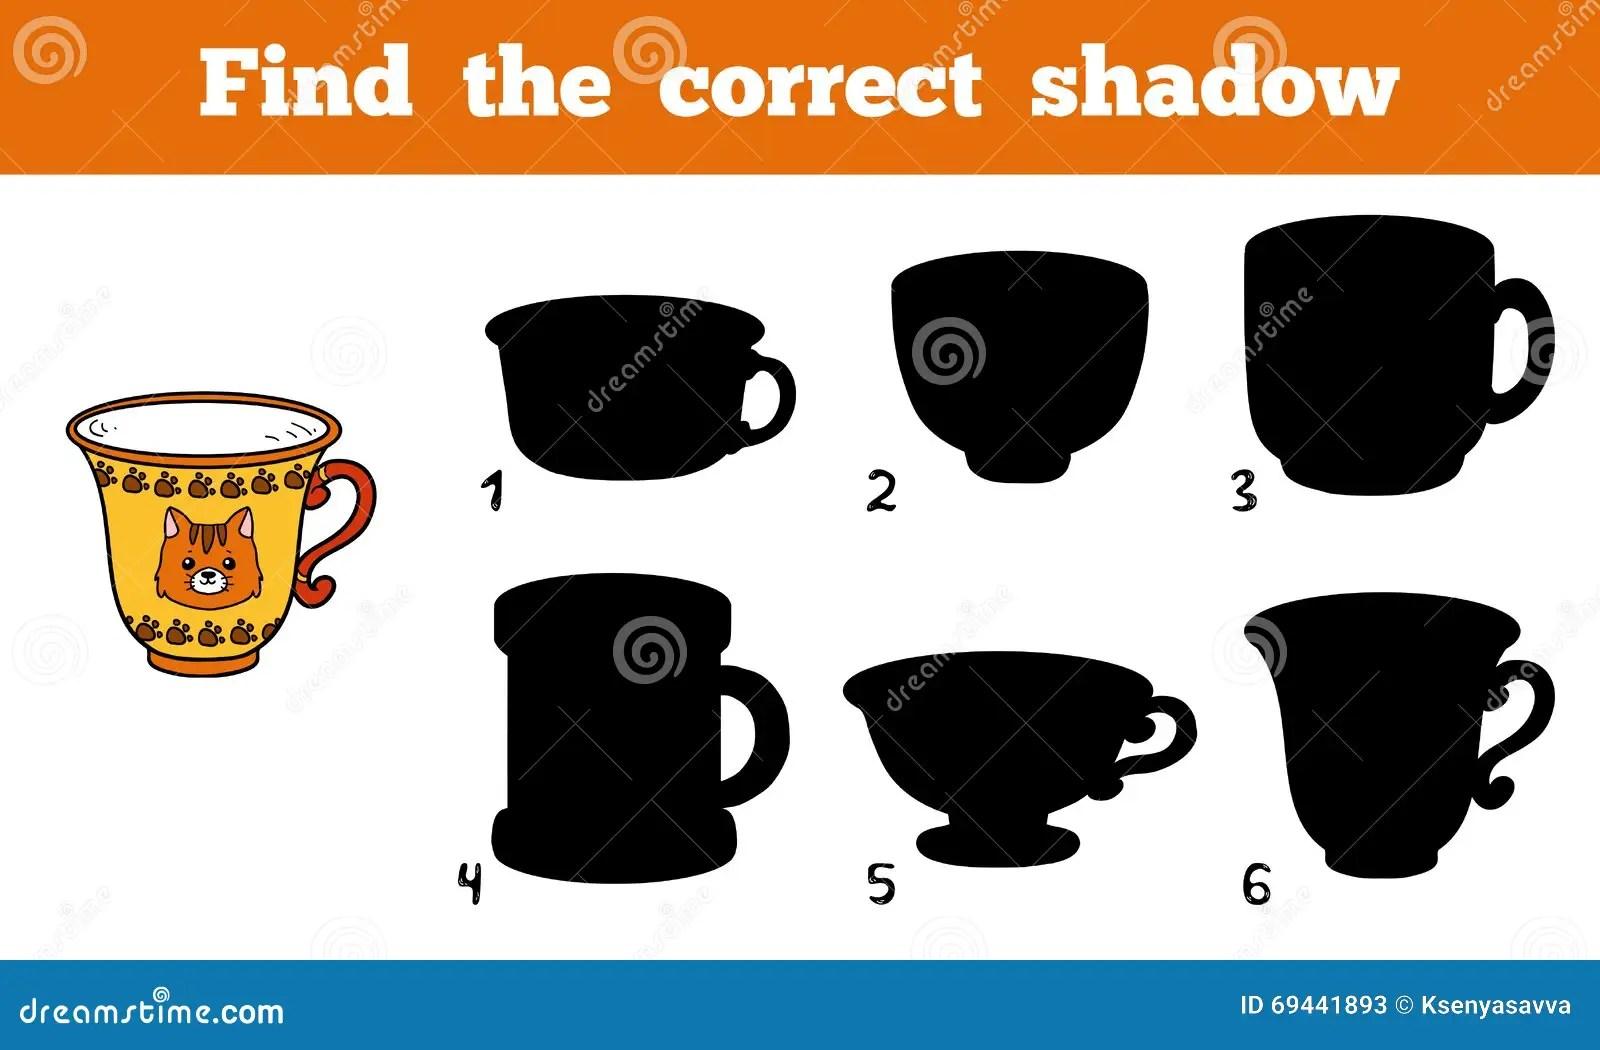 Find Correct Shadow For Each Object Cartoon Vector